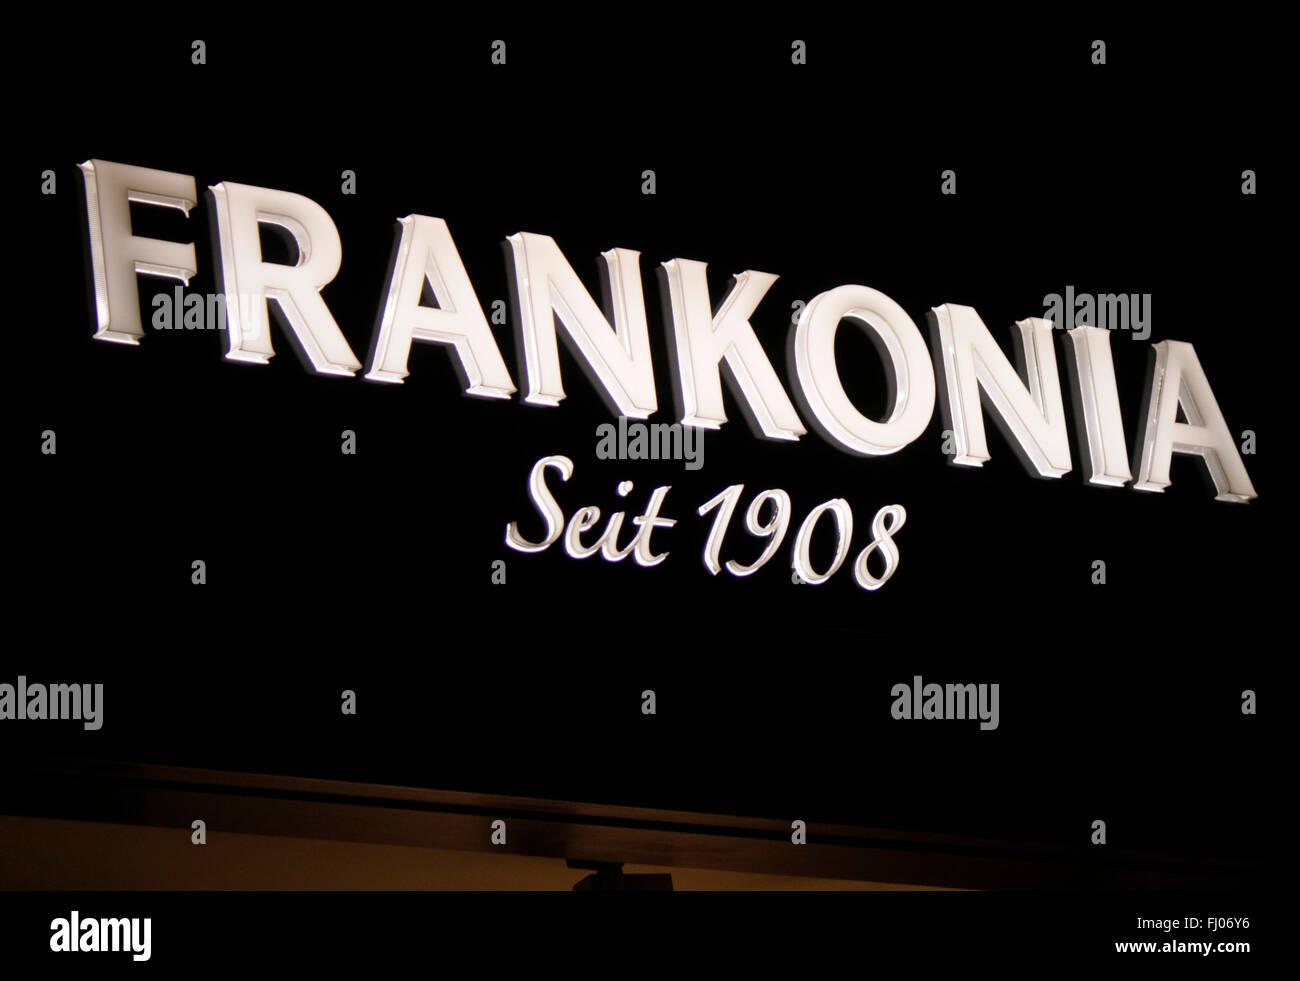 Markenname: 'Frankonia', Berlin. - Stock Image